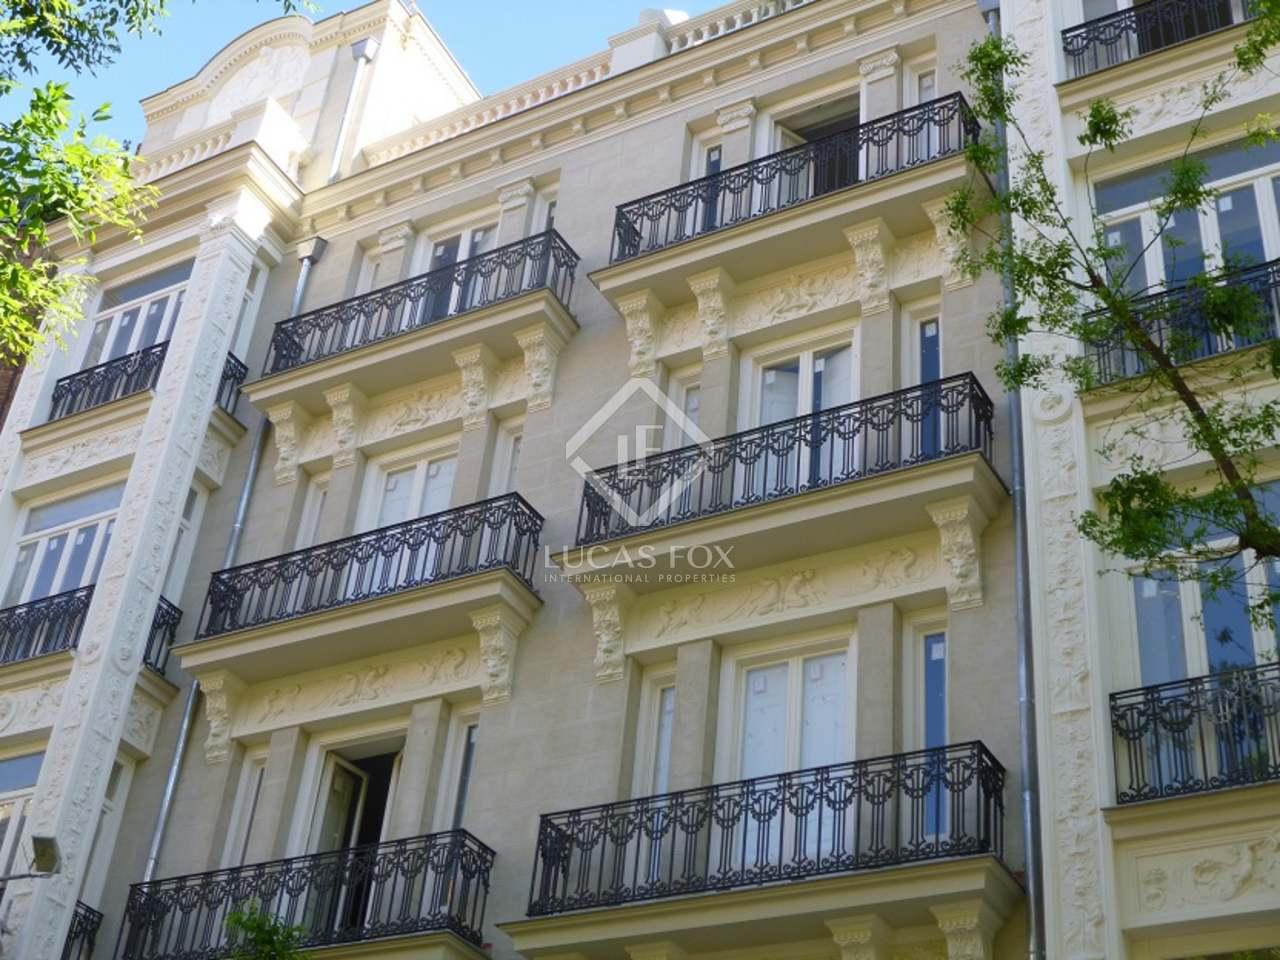 Apartamento de obra nueva de lujo en venta en chamber madrid - Zona chamberi madrid ...